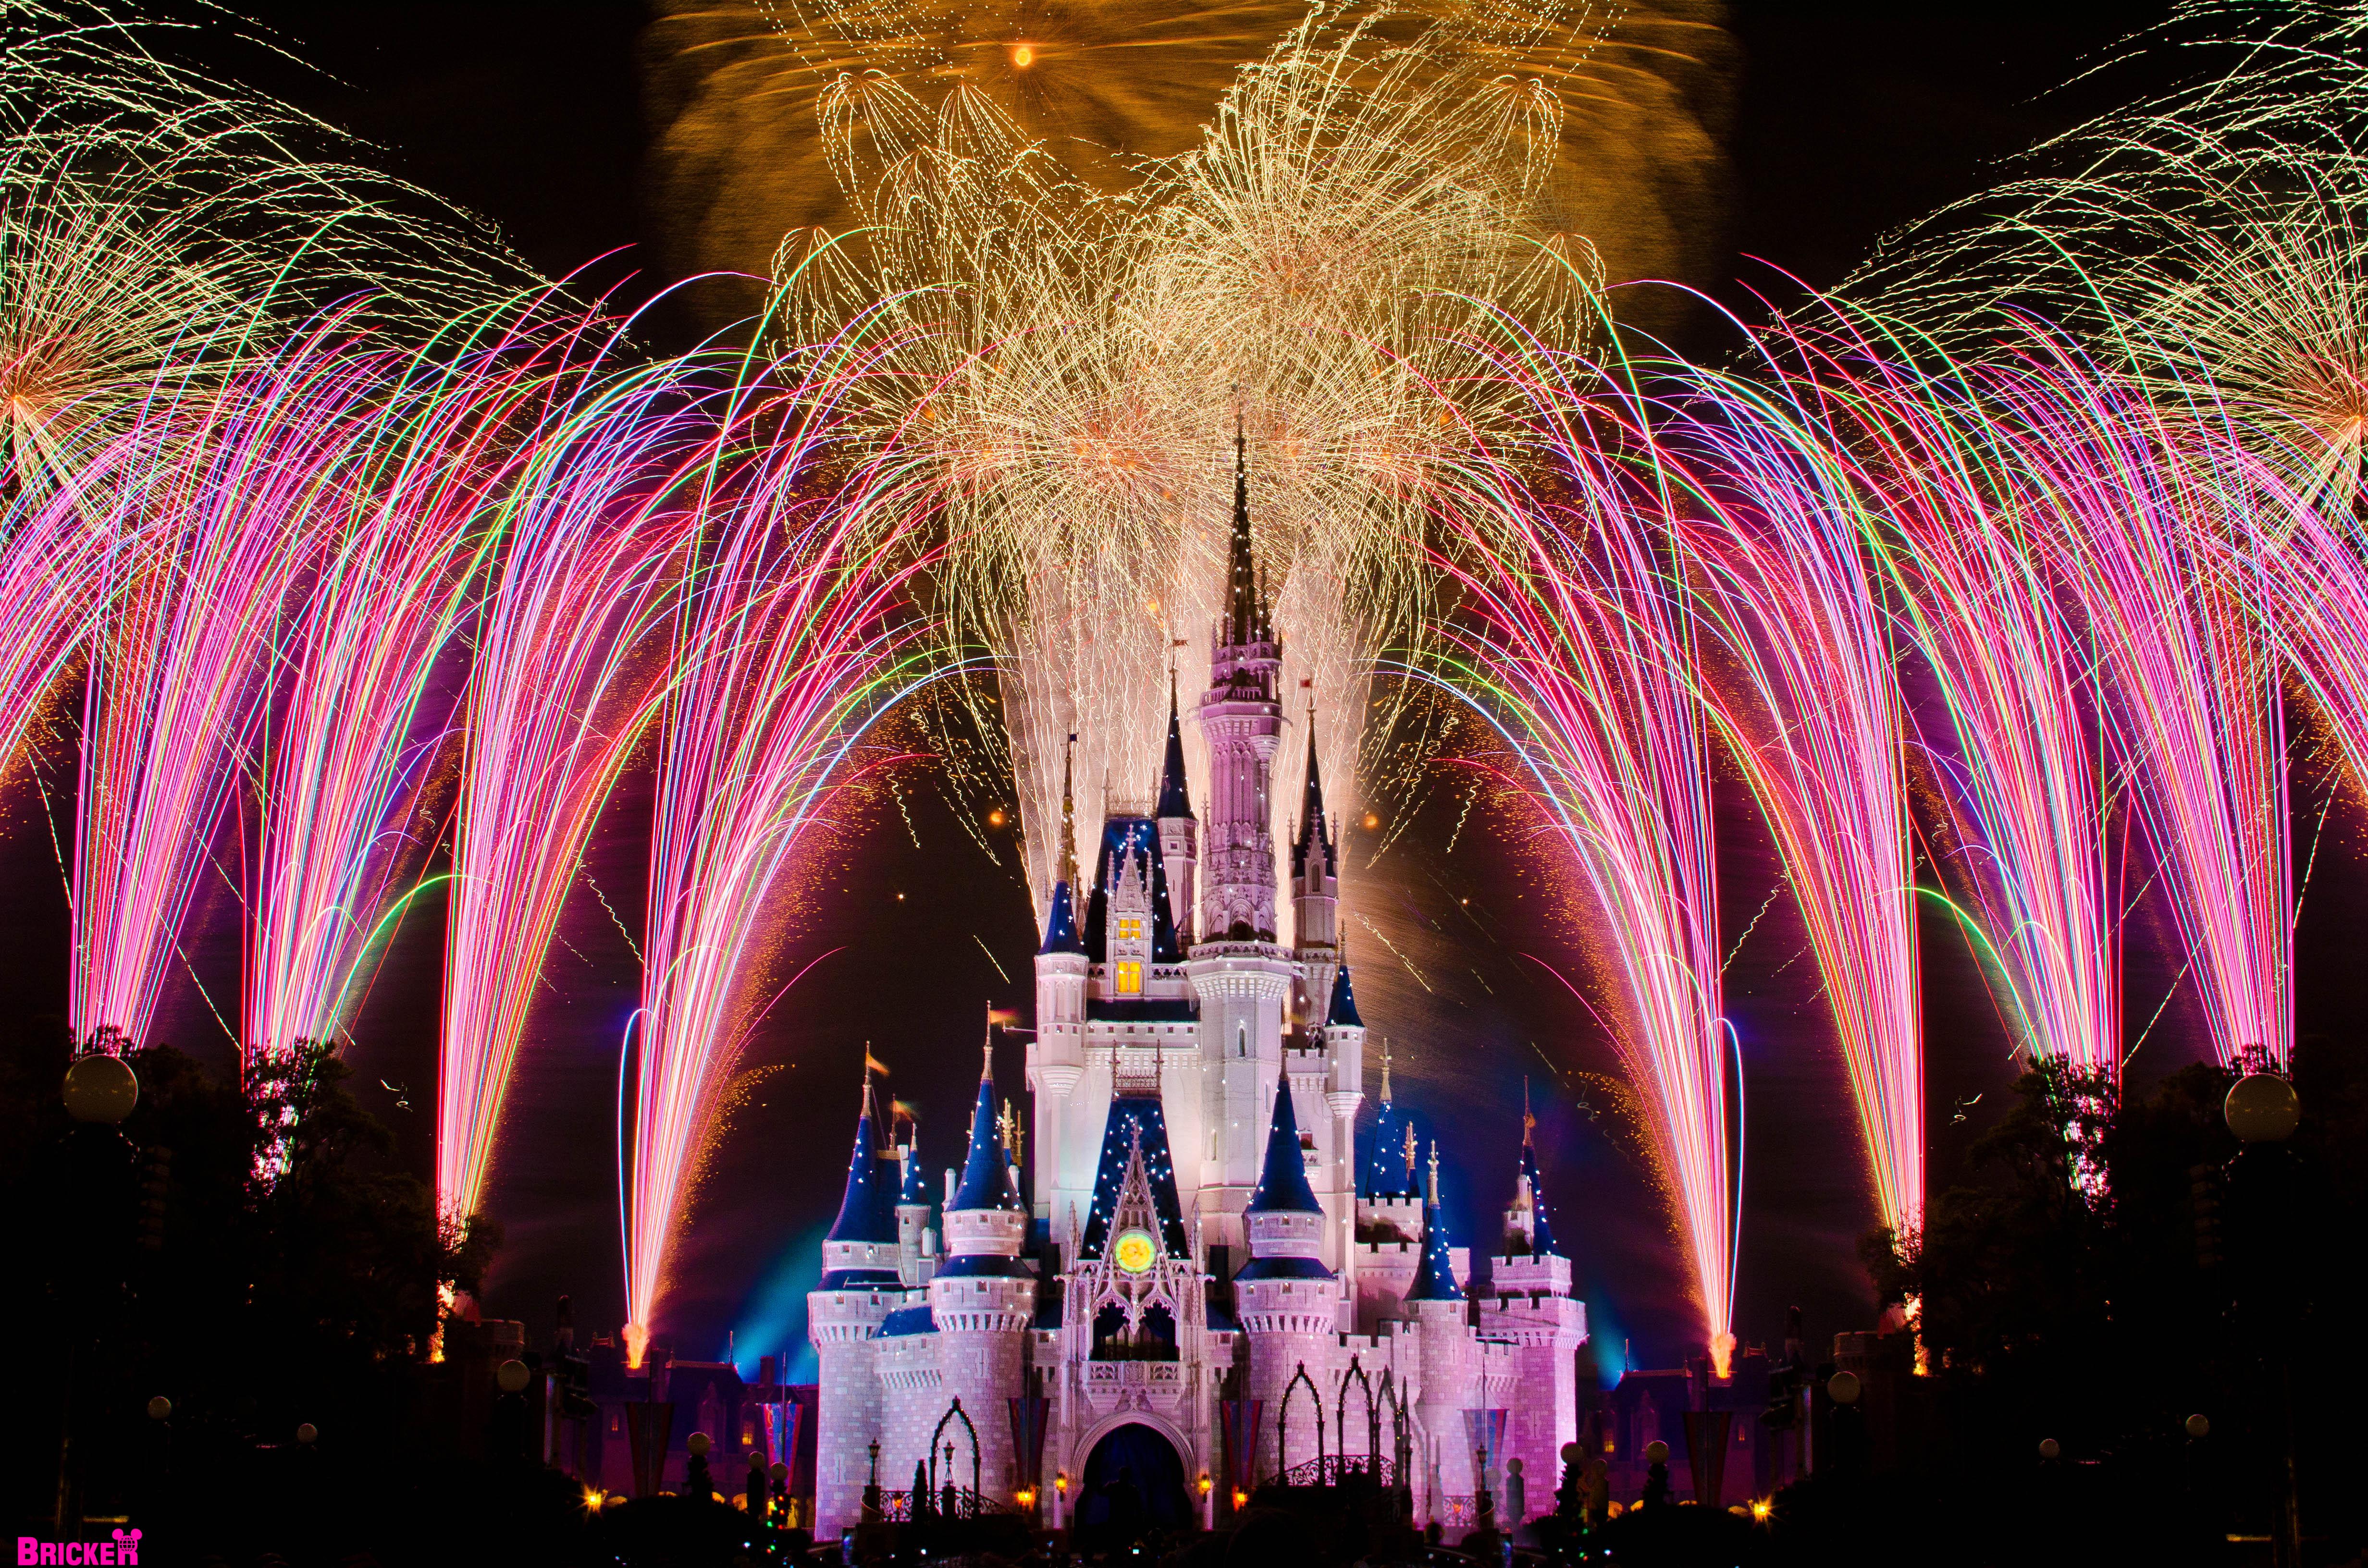 Disneyland Fireworks Wallpaper   HD Wallpapers 4928x3264